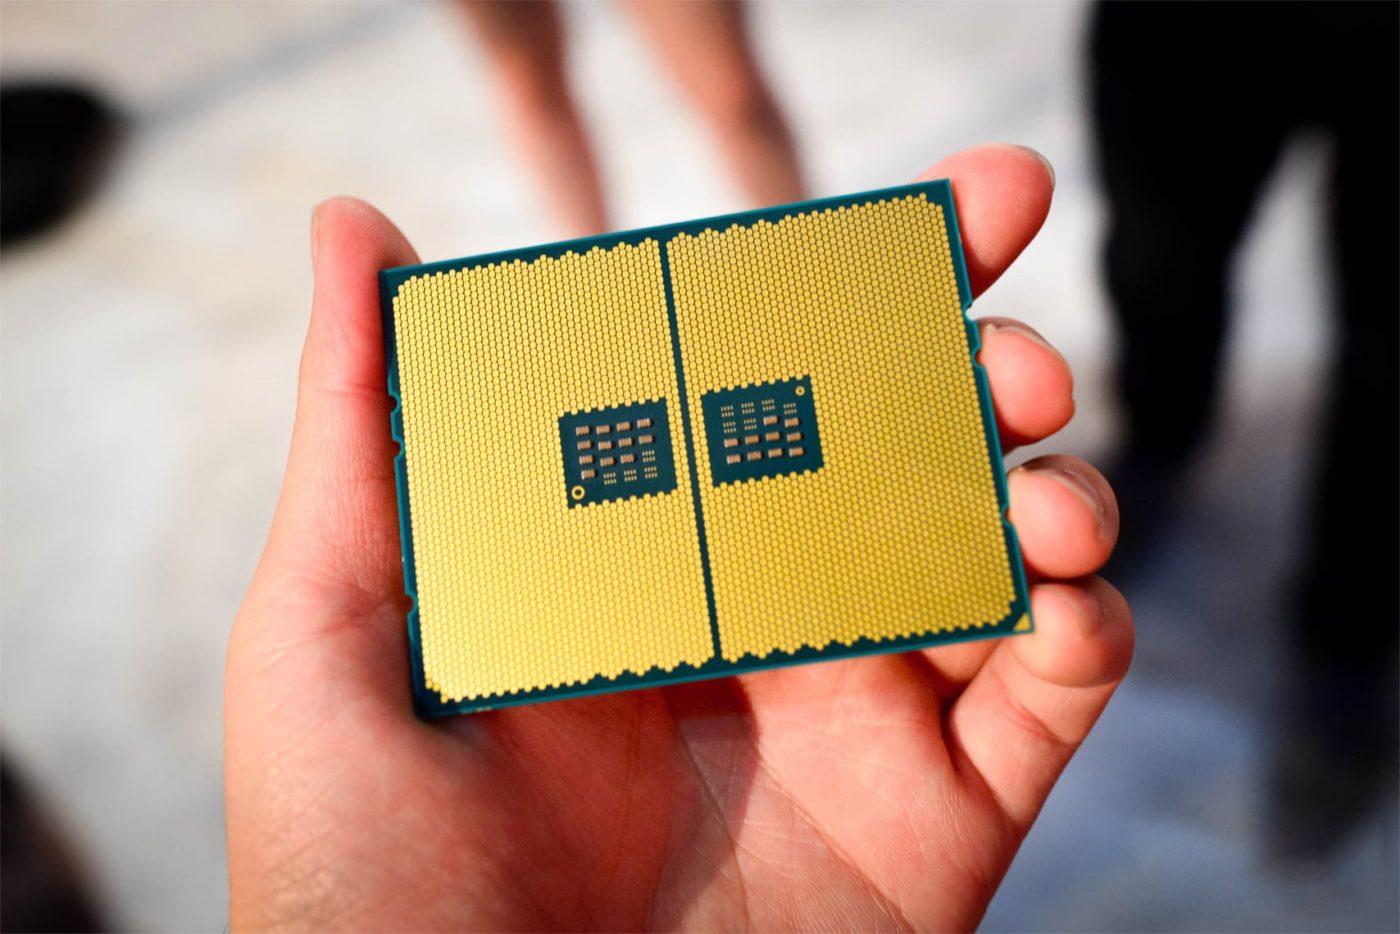 AMD's Threadripper CPU